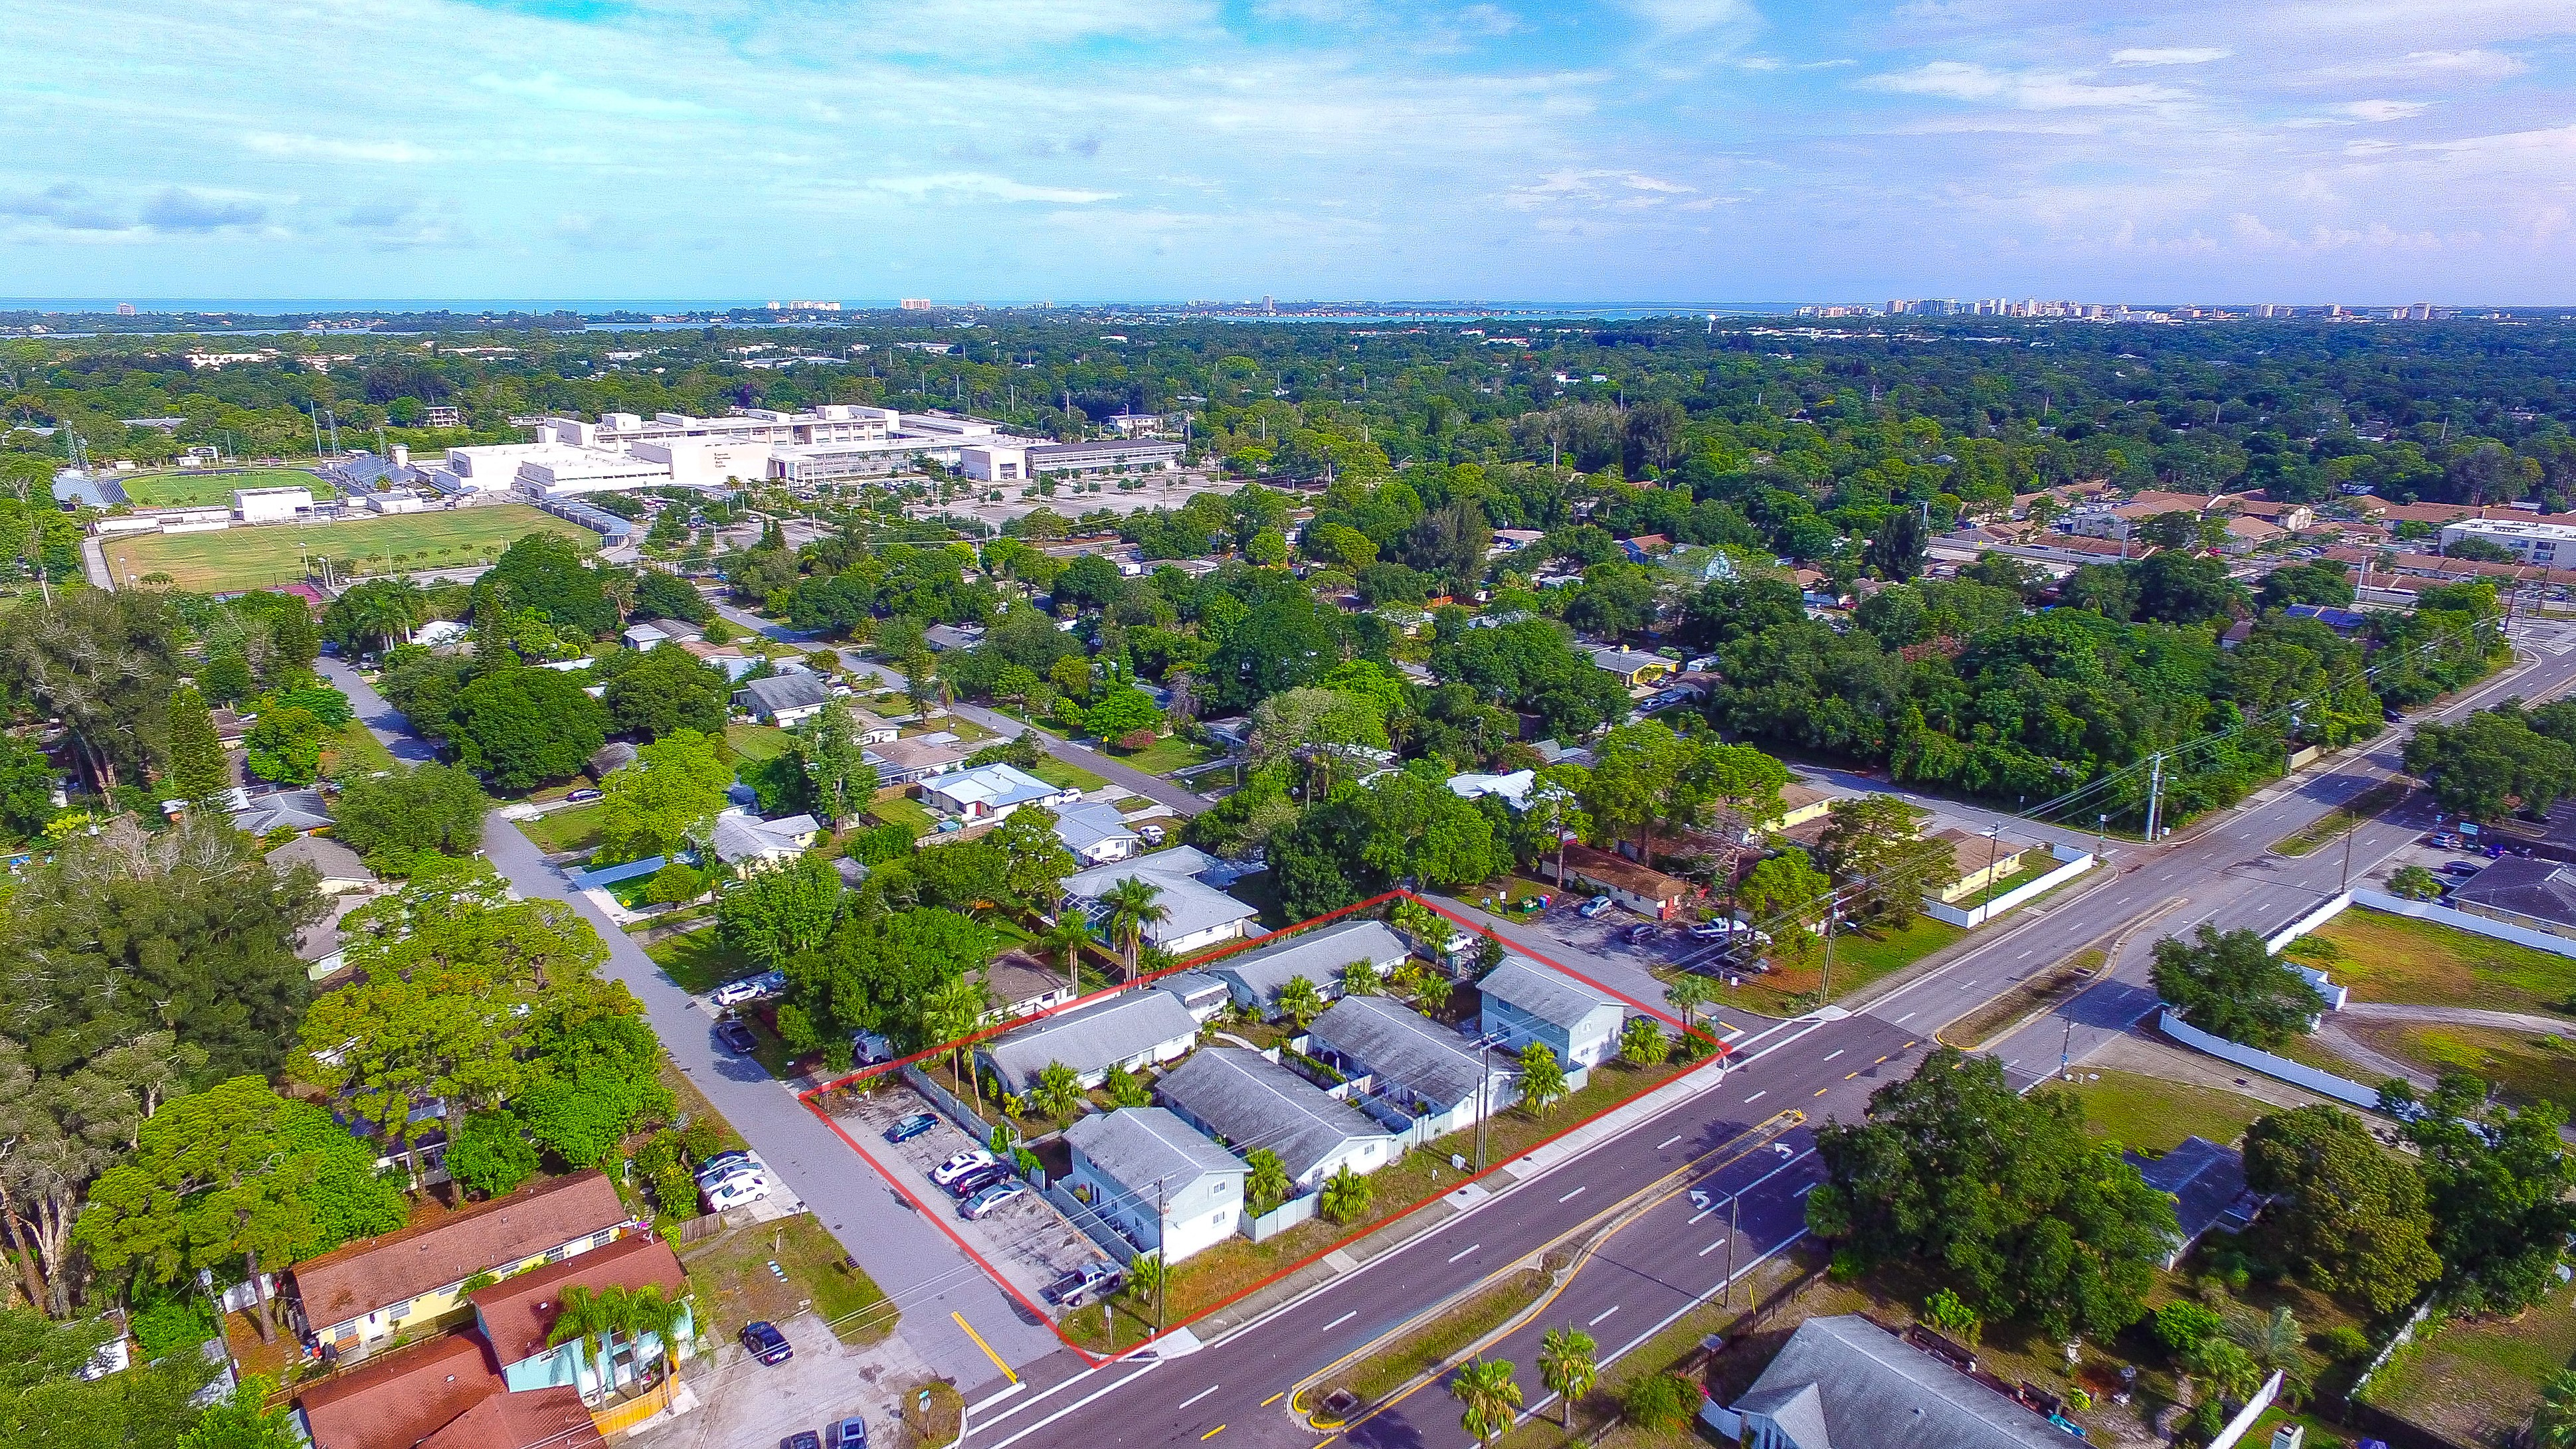 JUST SOLD! 12 Unit Apartment Building in Sarasota, FL